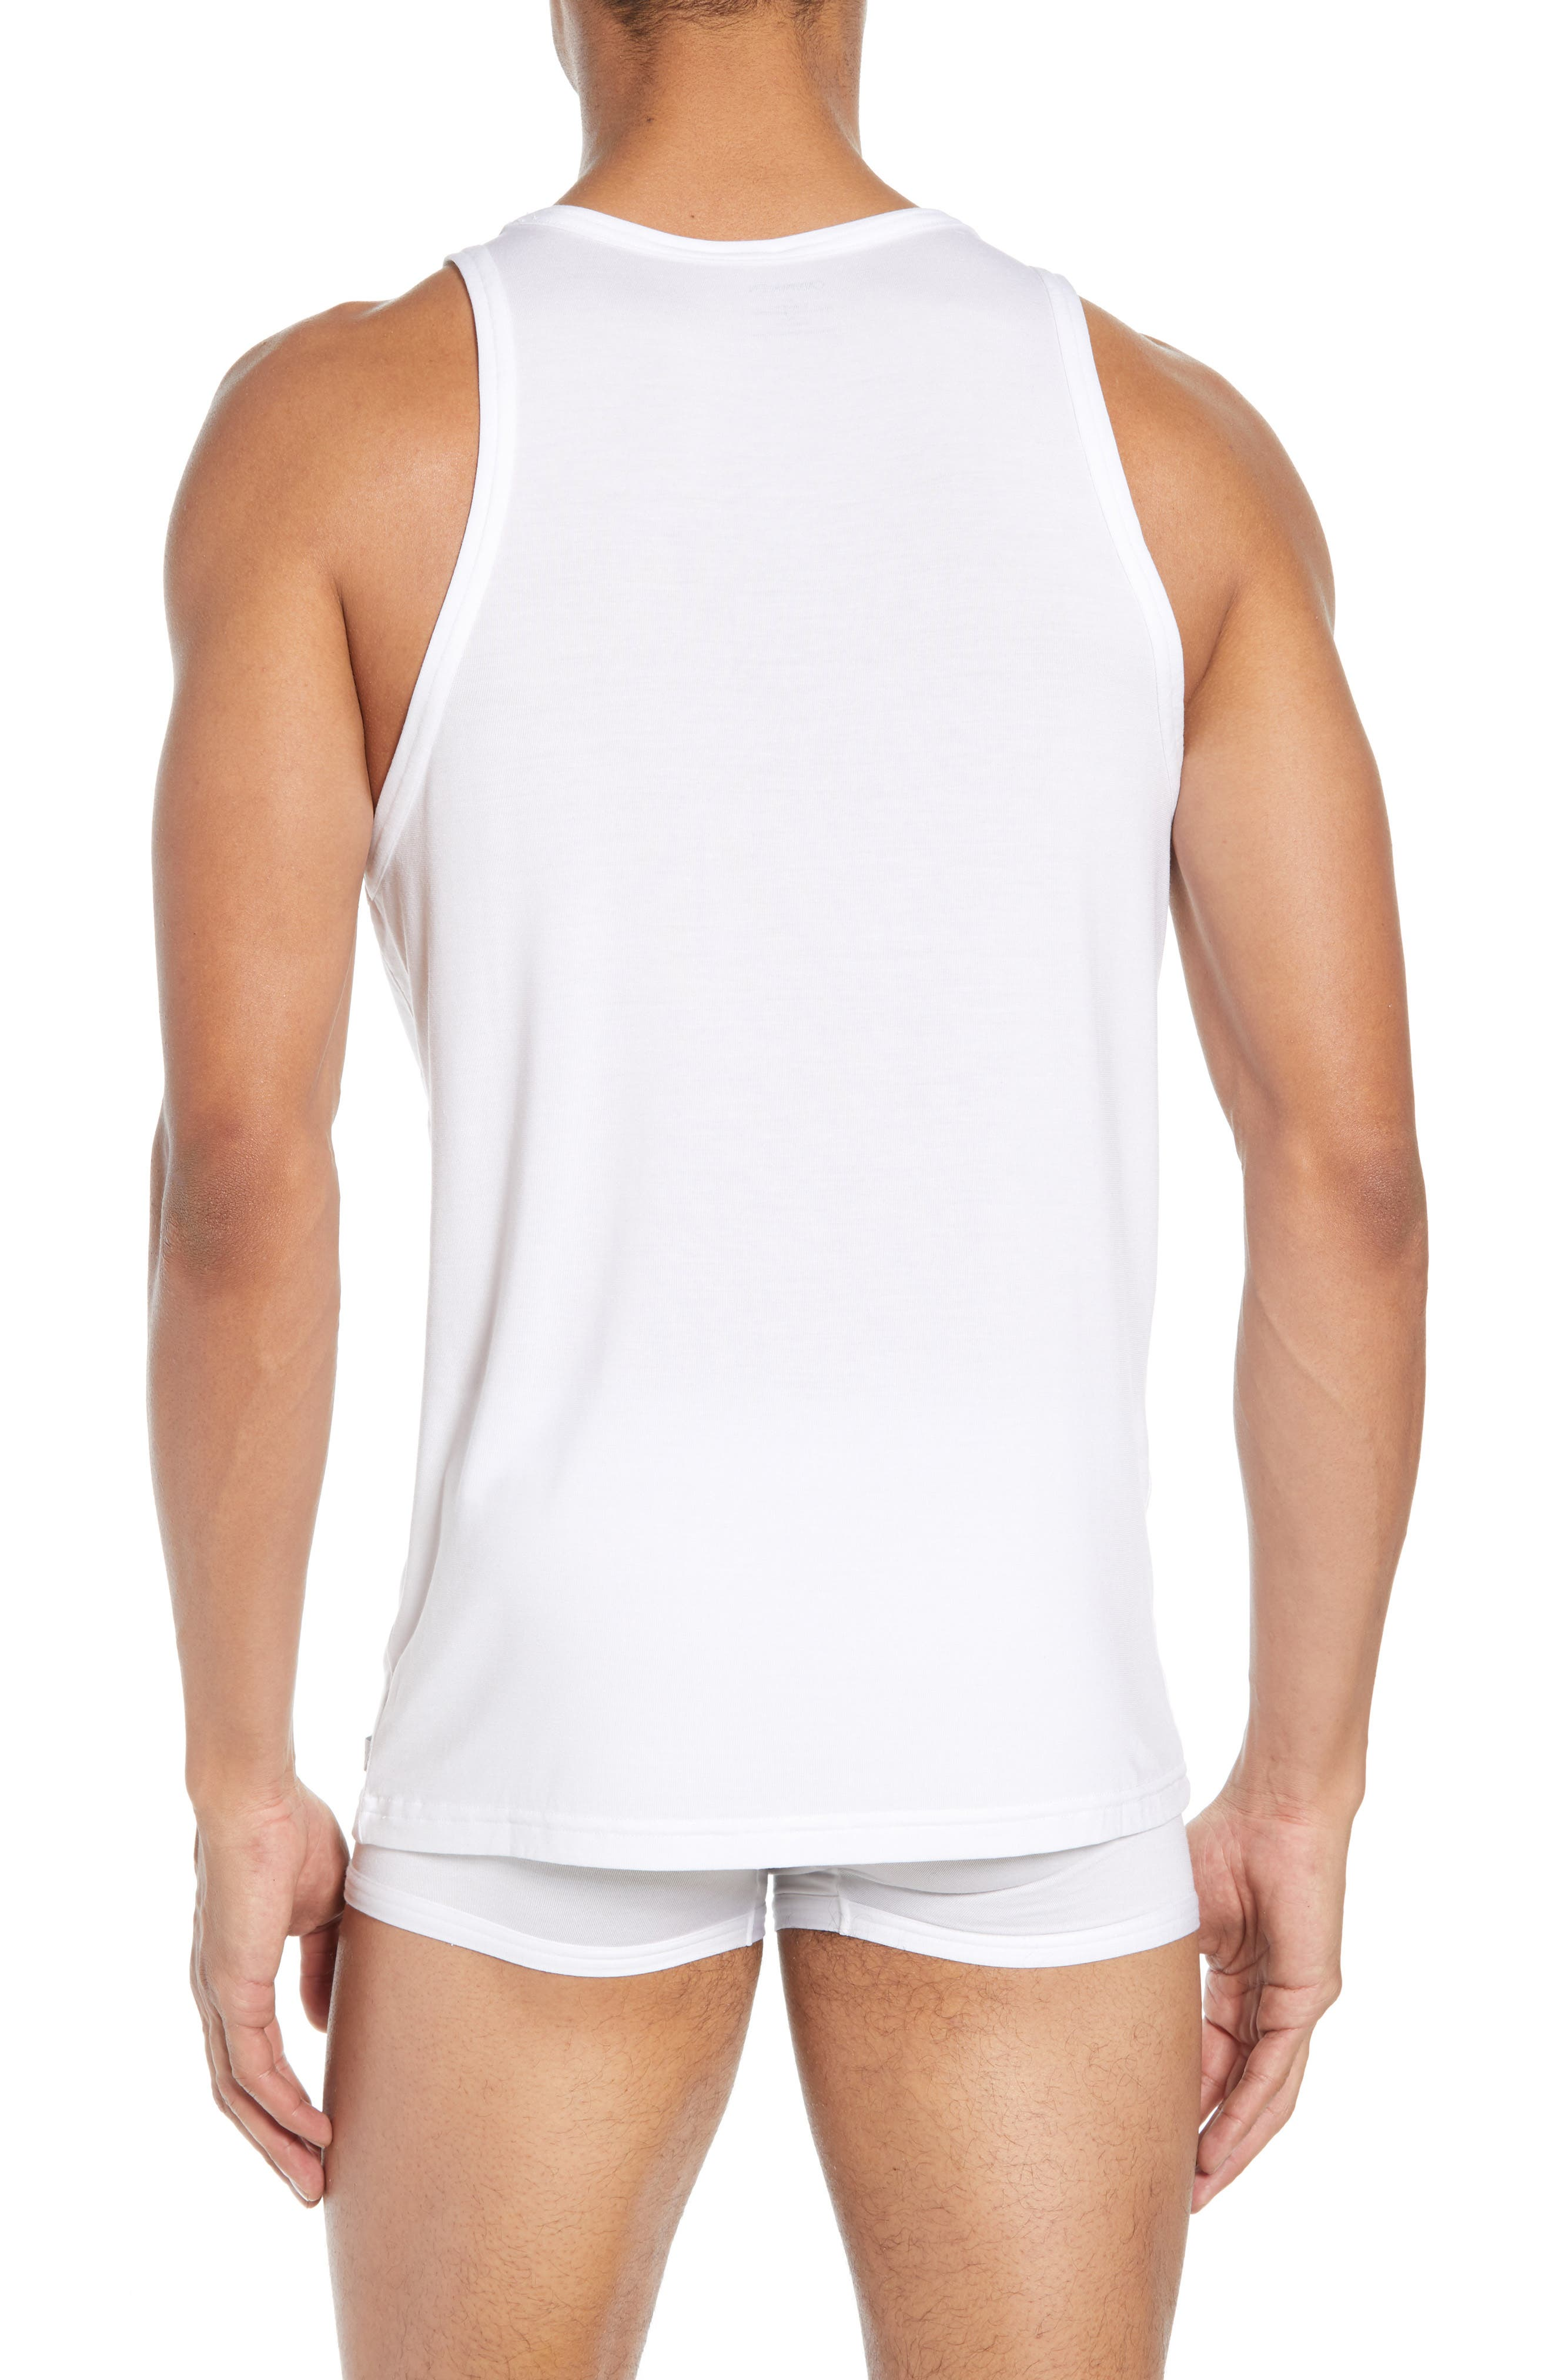 5ec5286b3af5a4 Undershirts Calvin Klein Underwear and Socks